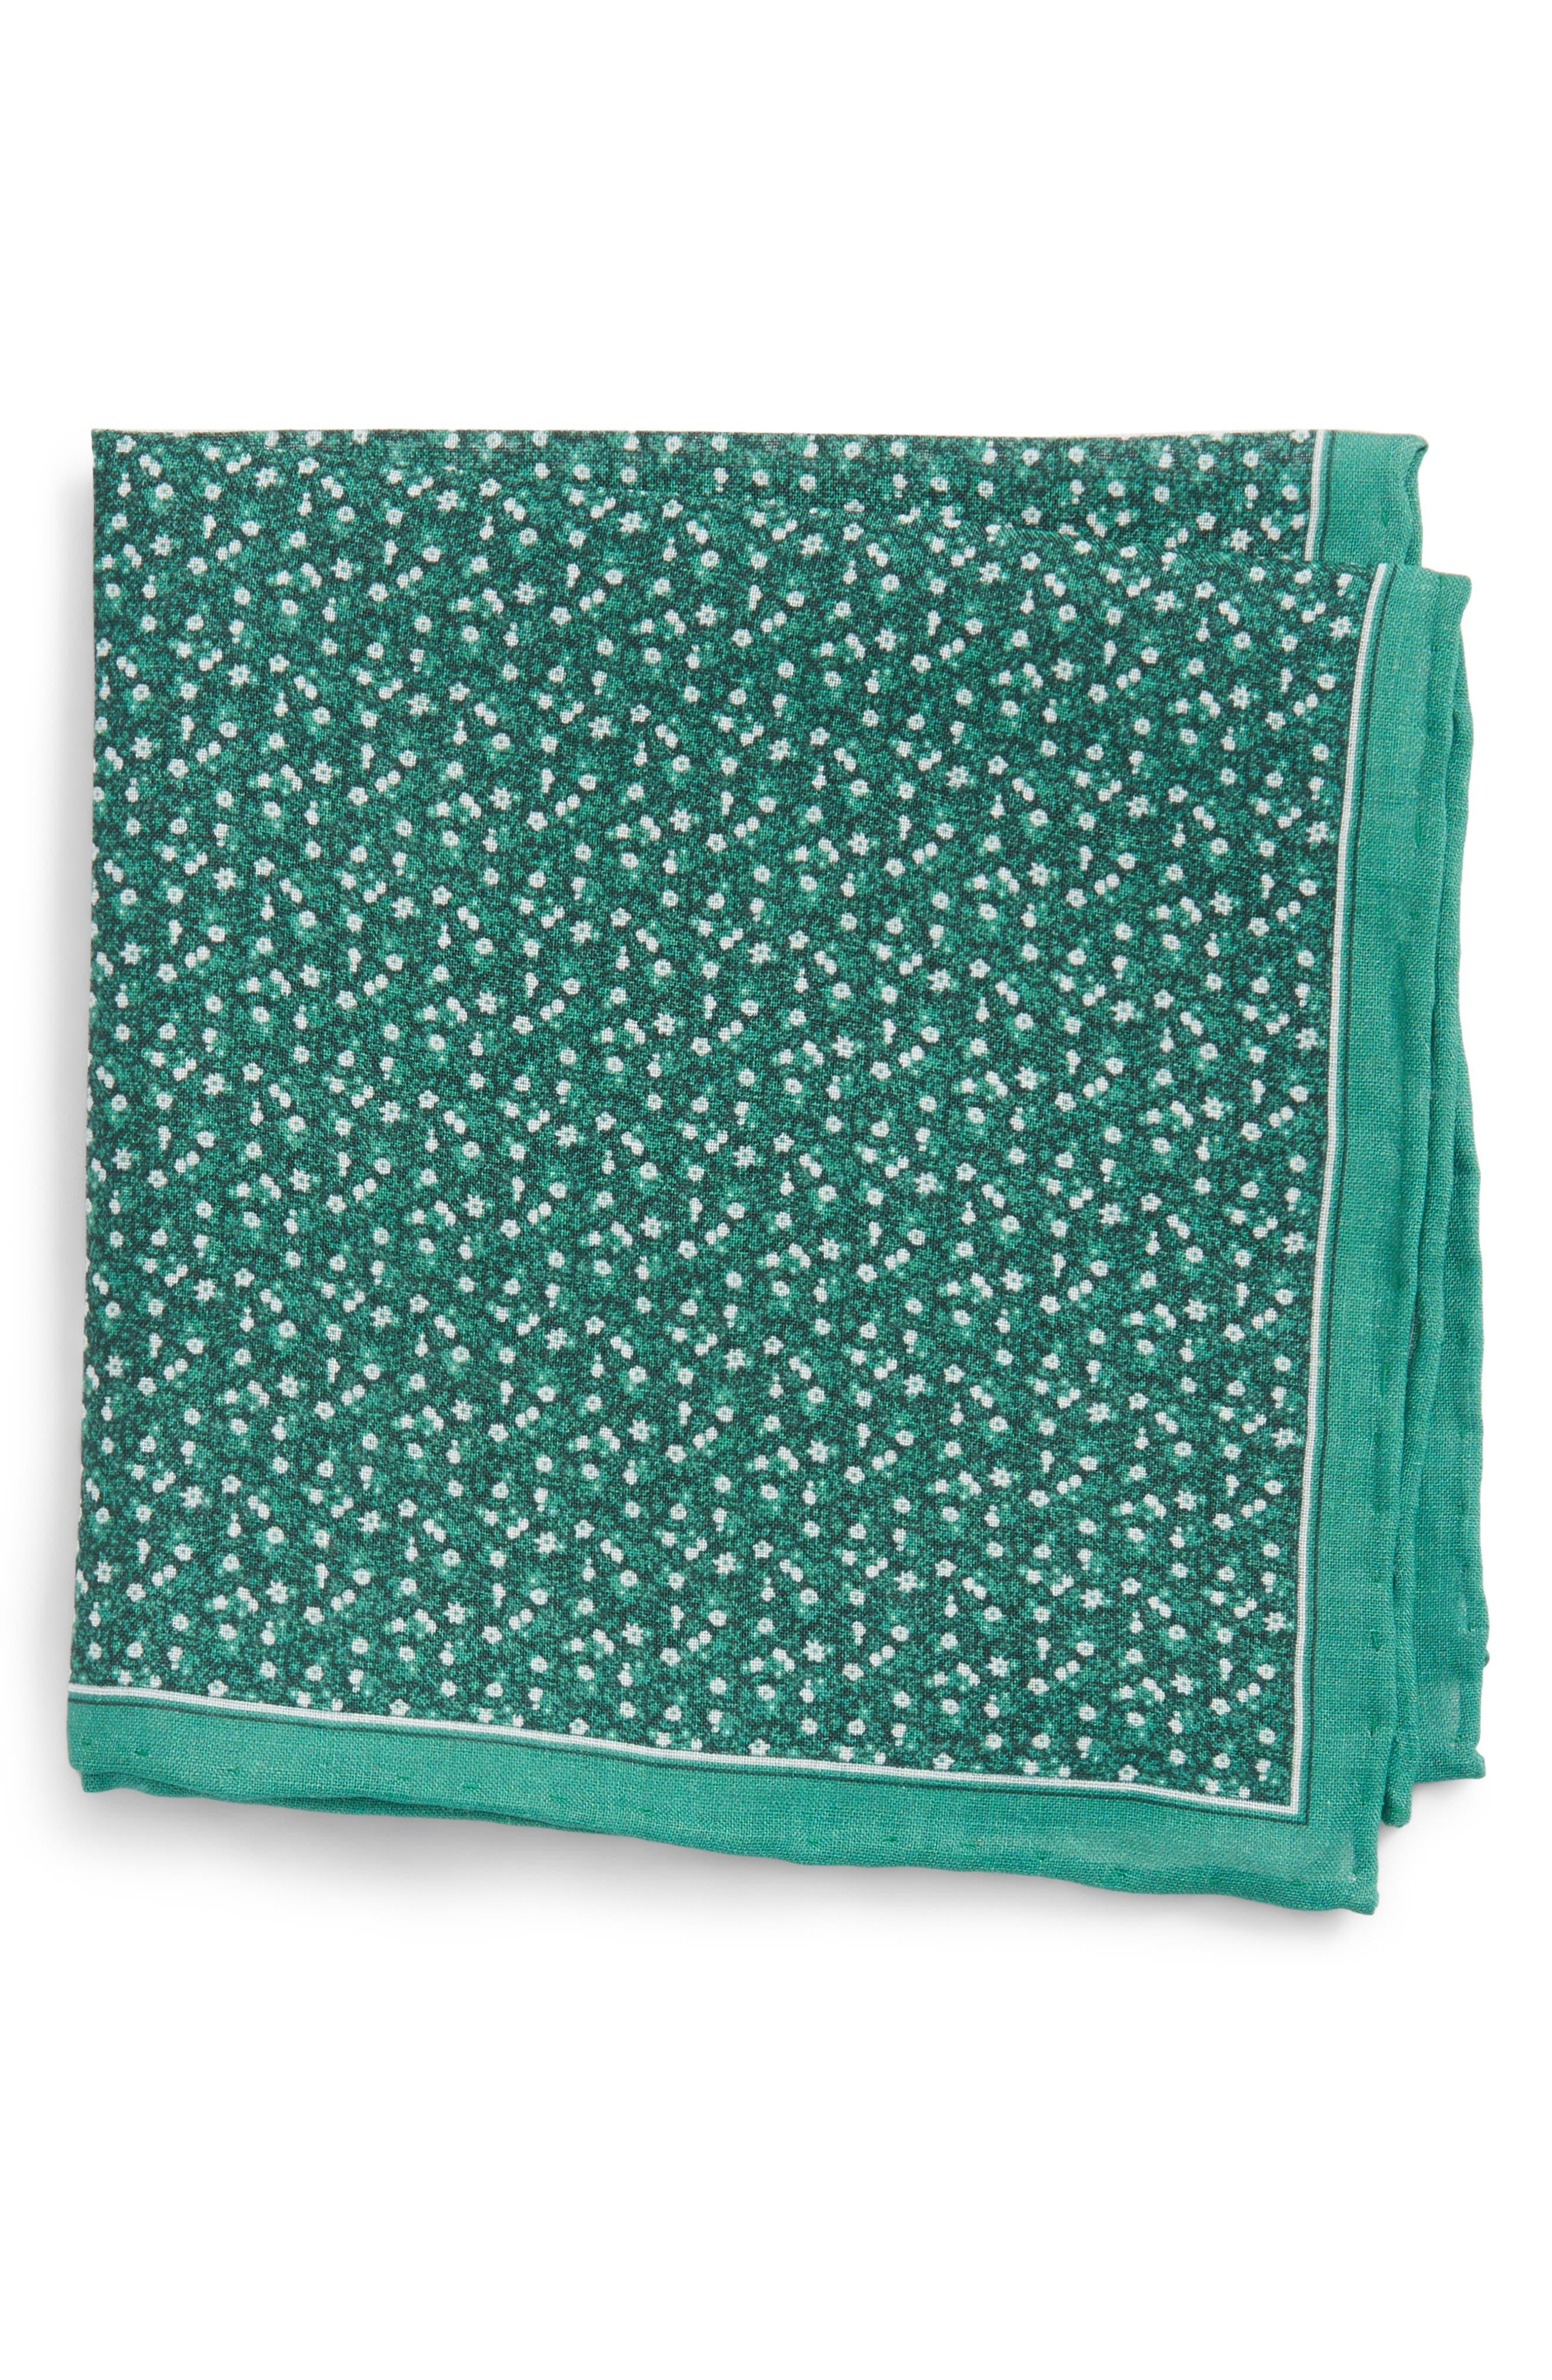 Floral Mark Linen Pocket Square,                             Main thumbnail 1, color,                             300